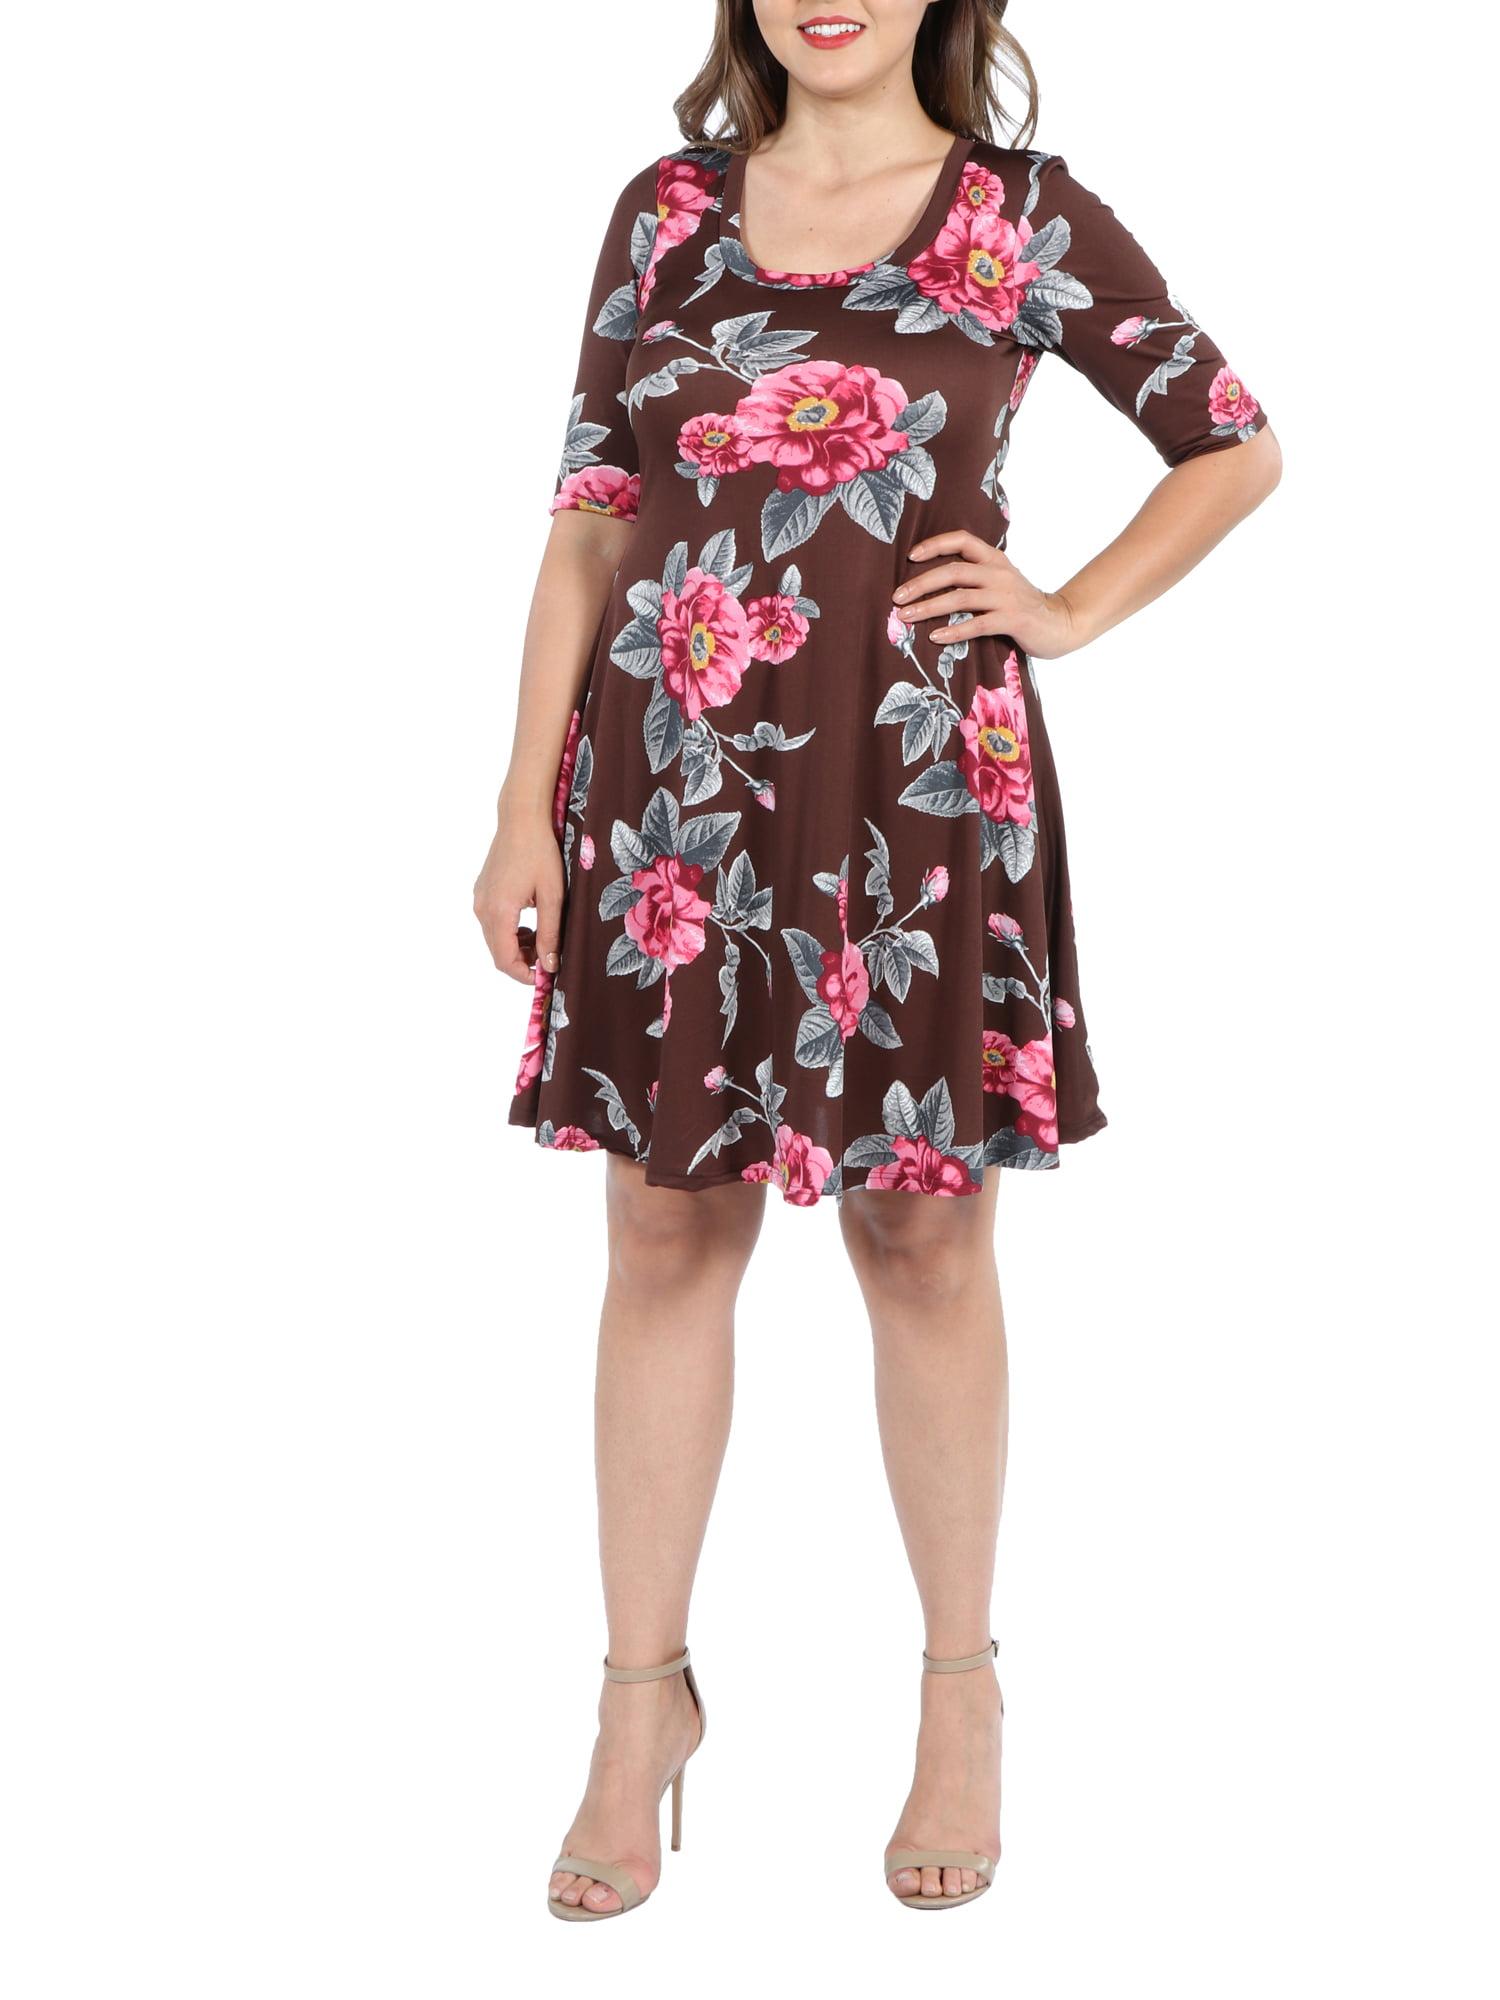 24Seven Comfort Apparel Gemma Brown Floral Plus Size Mini Dress